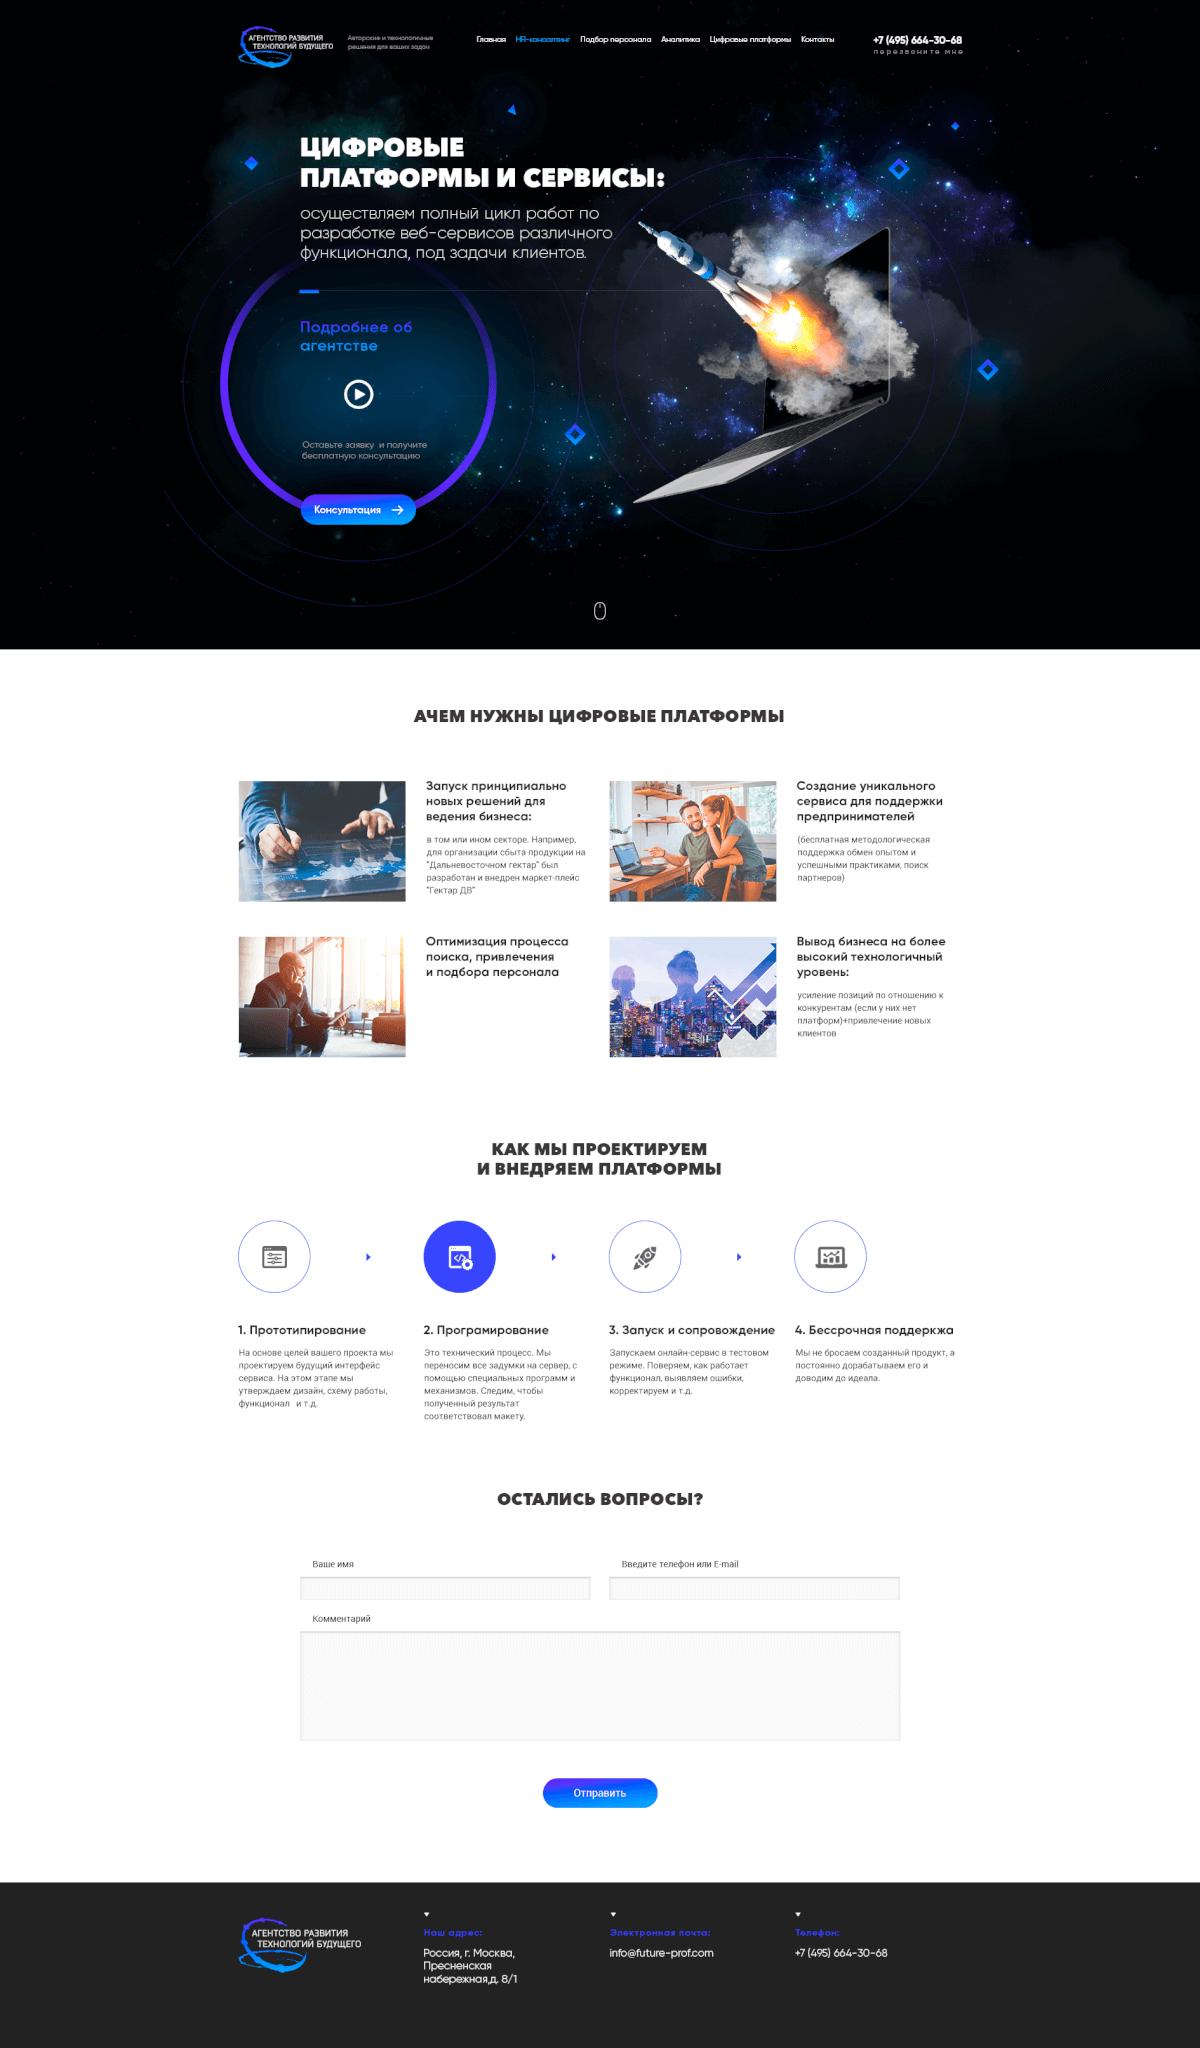 Агентство развития технологий будущего